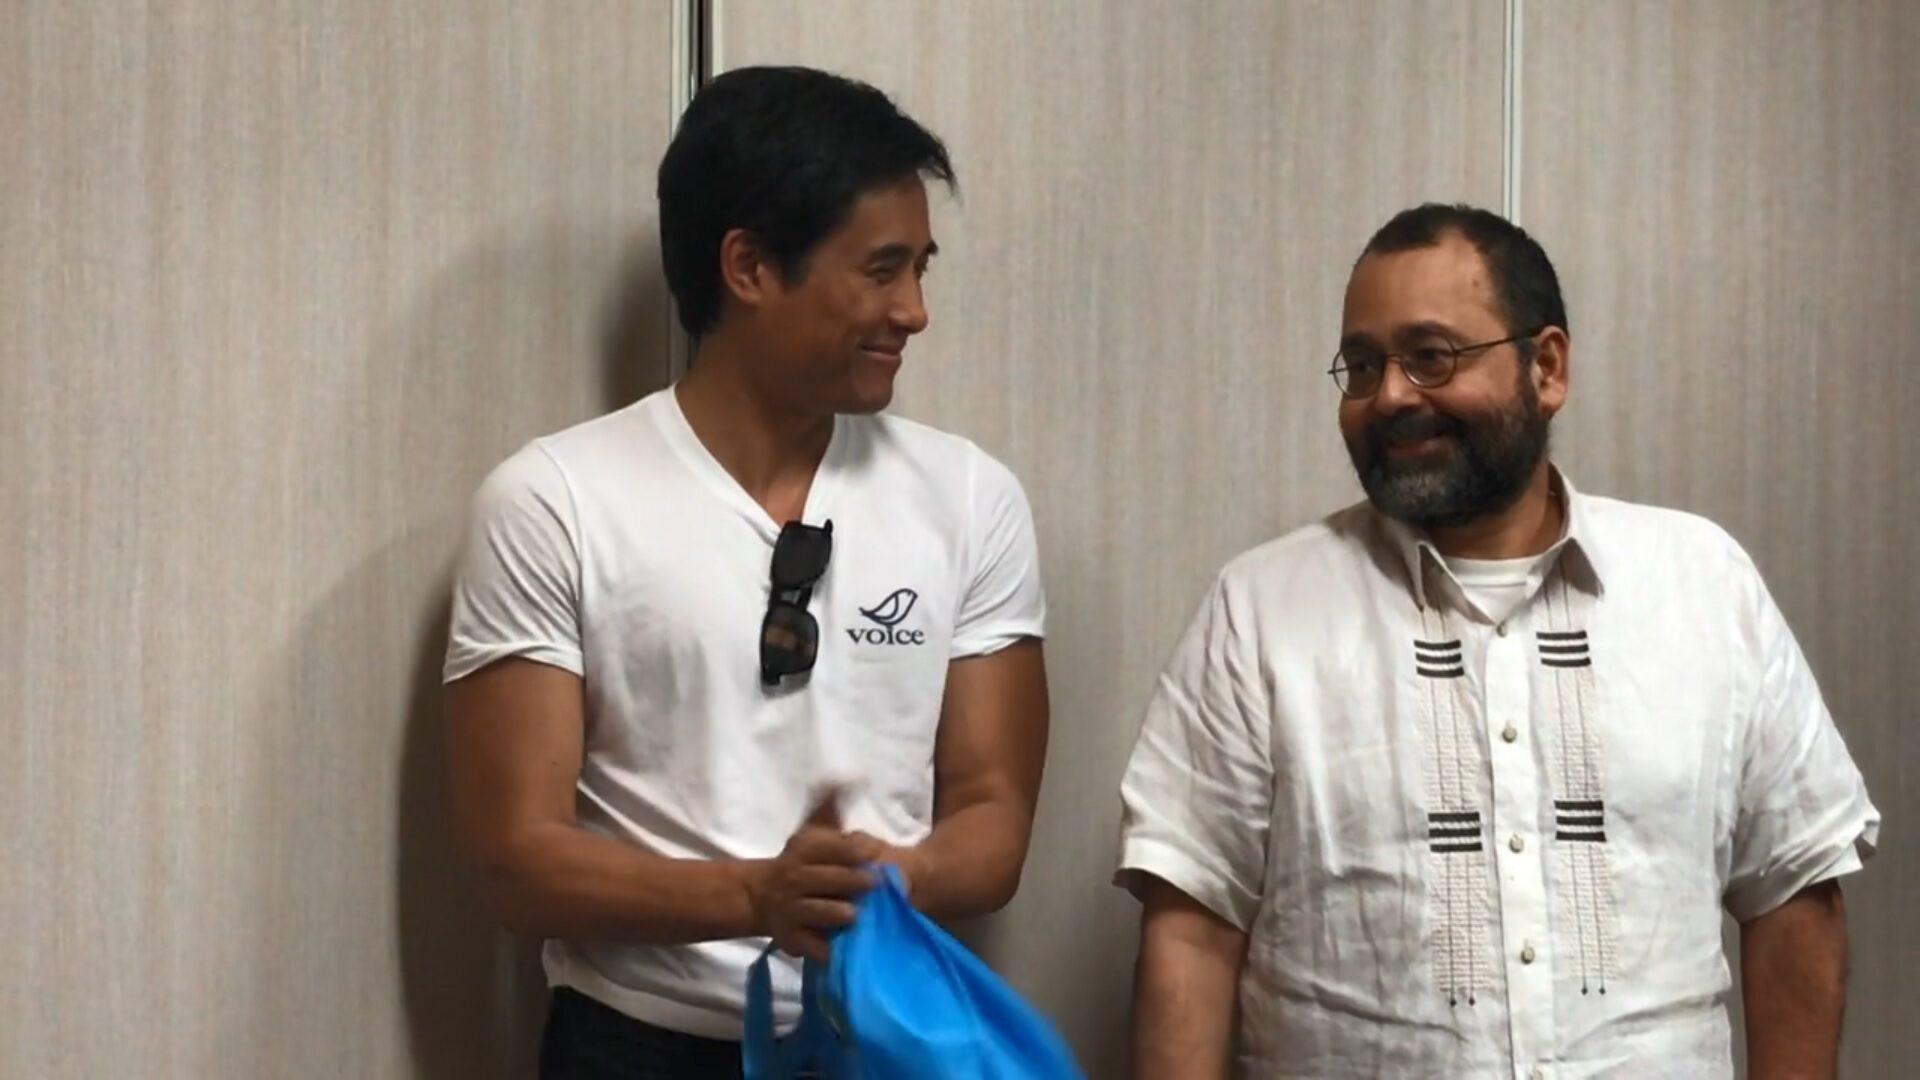 Chito Gascon inspires Vietnamese activists